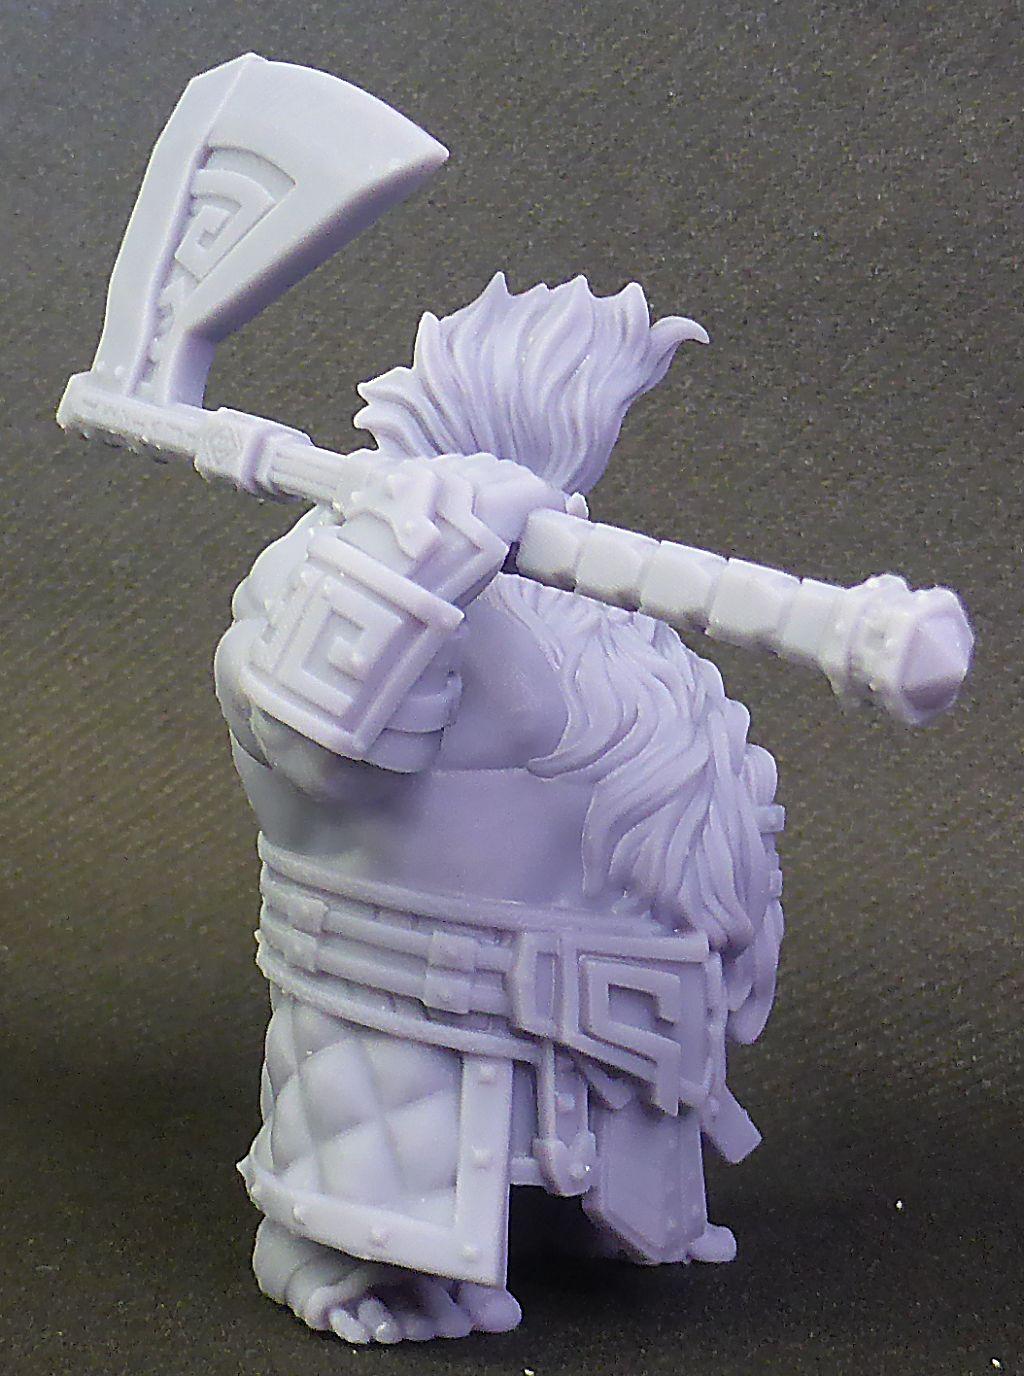 Impression 3D Résine - Figurine de Nain Nain-016